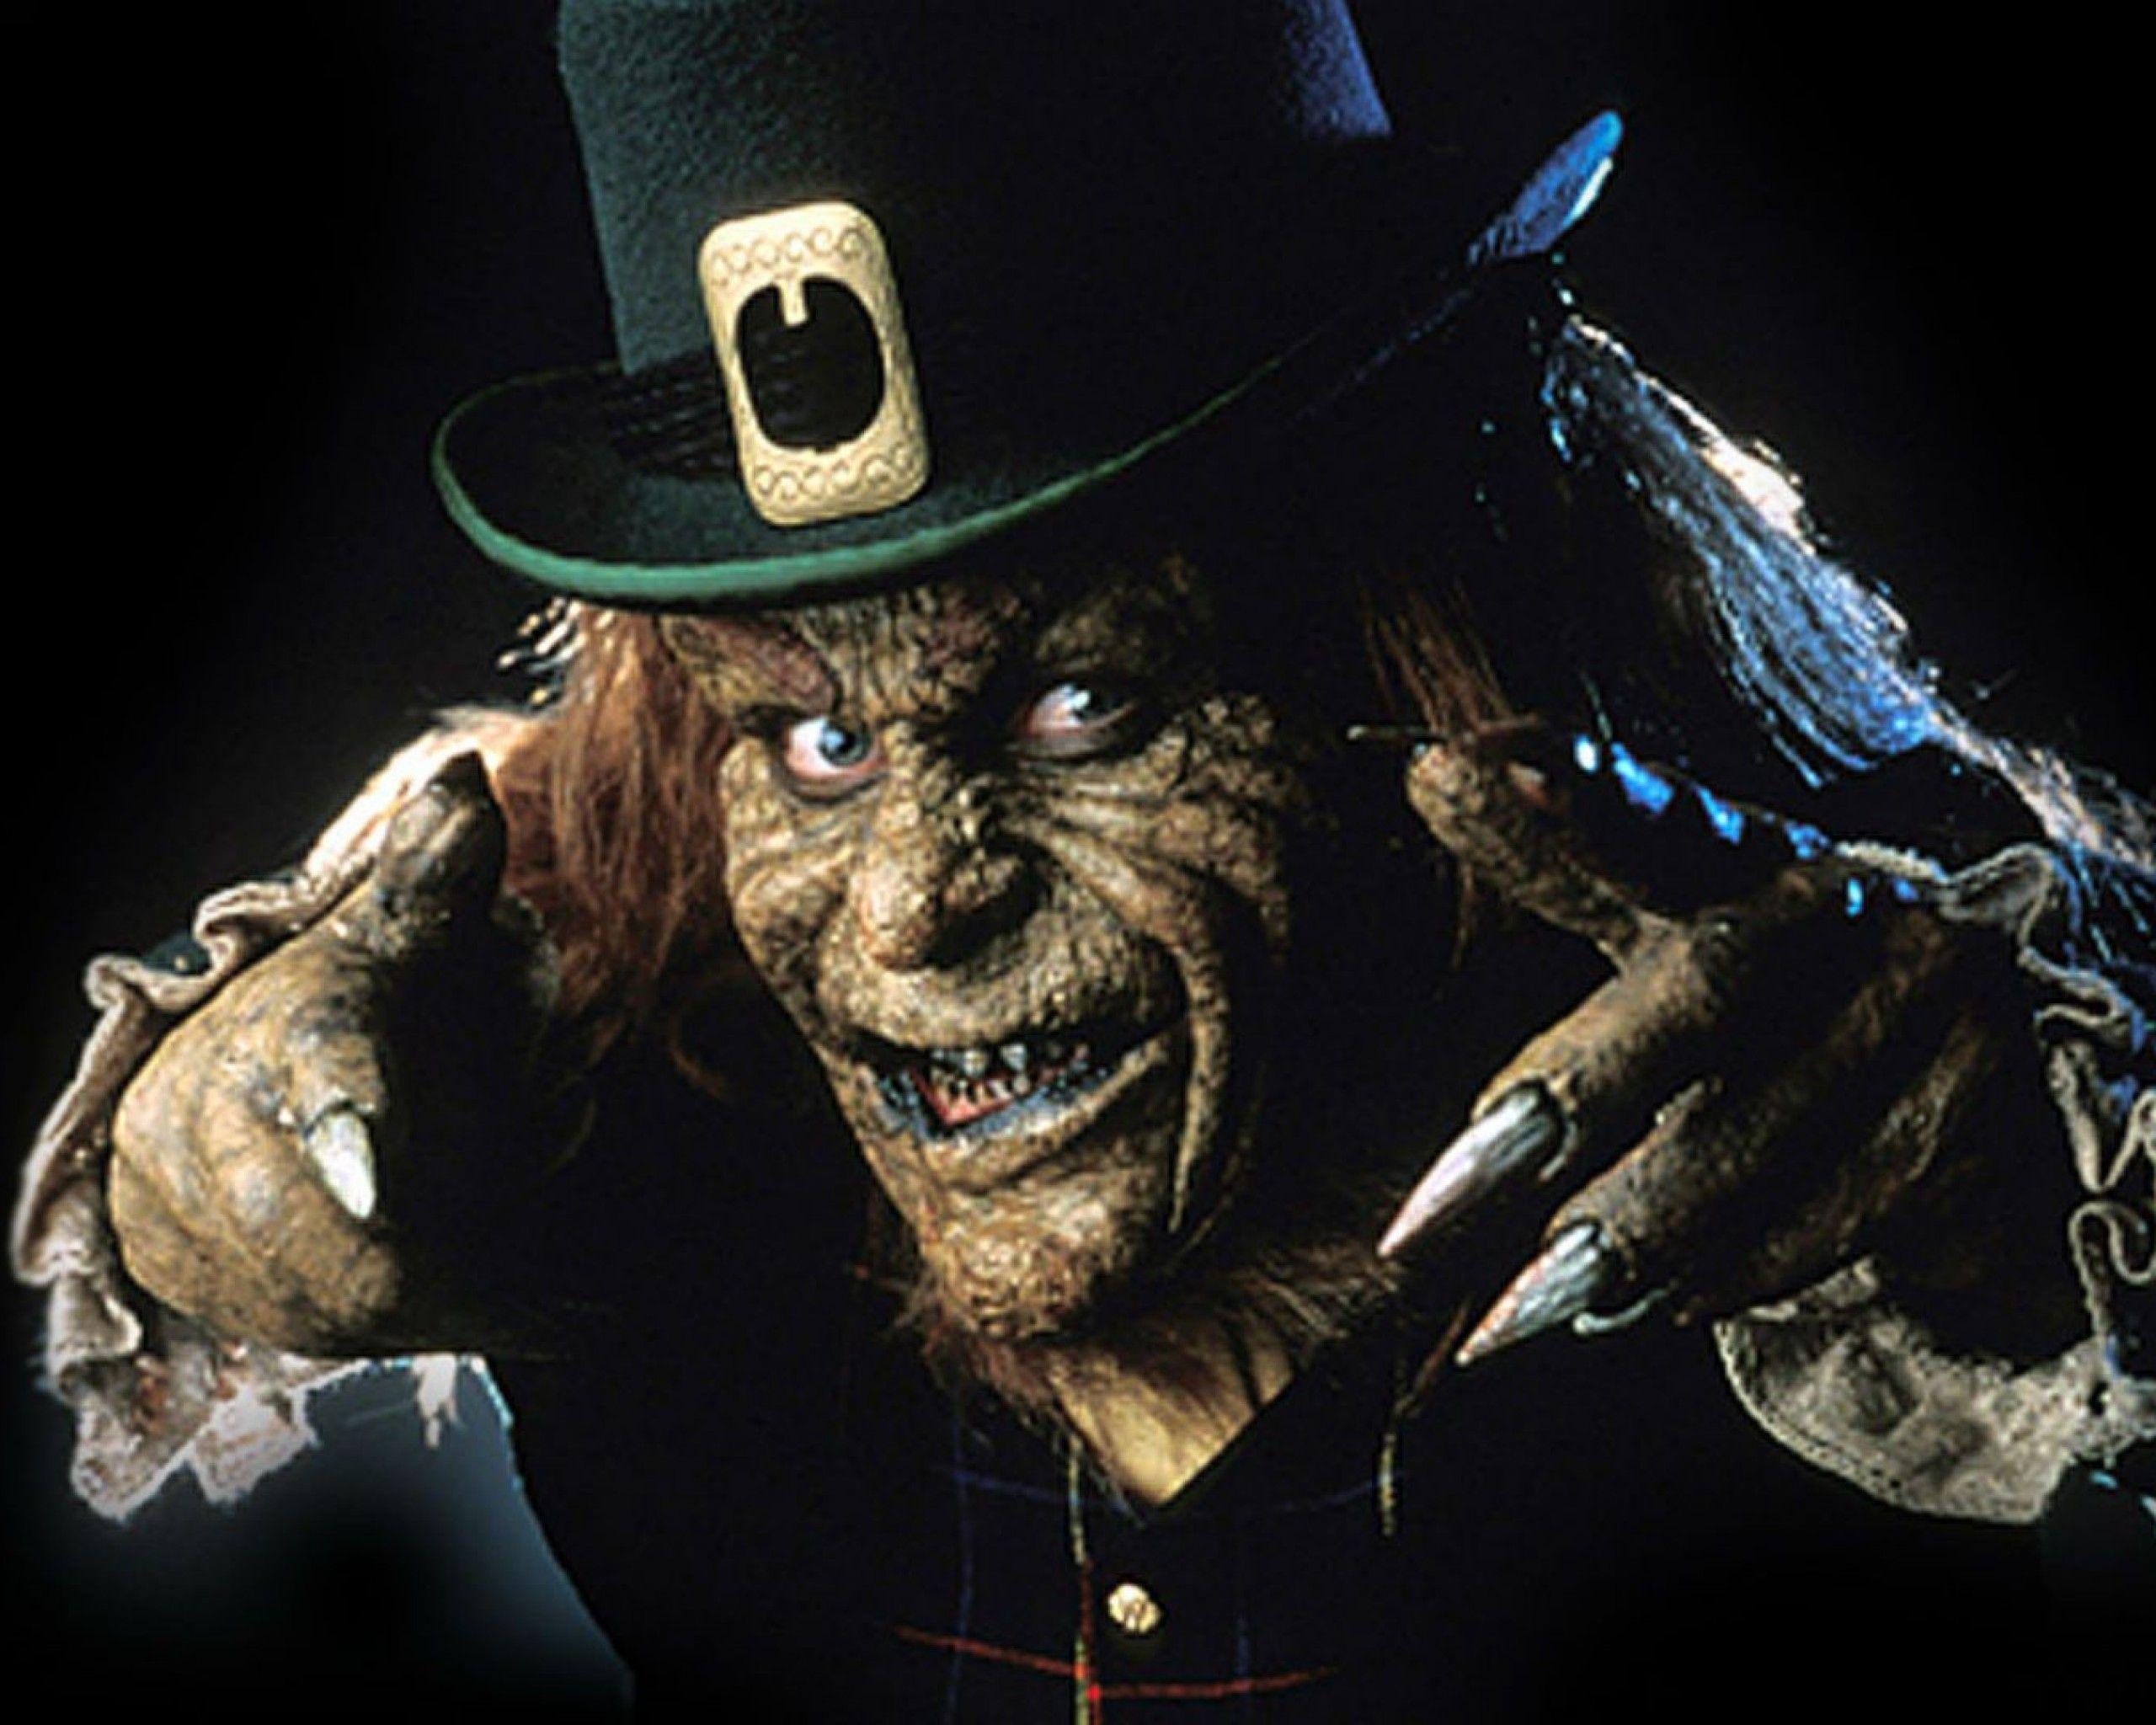 Leprechaun Movie Wallpapers As Horror Movies Scariest Leprechaun Movie Horror Movies